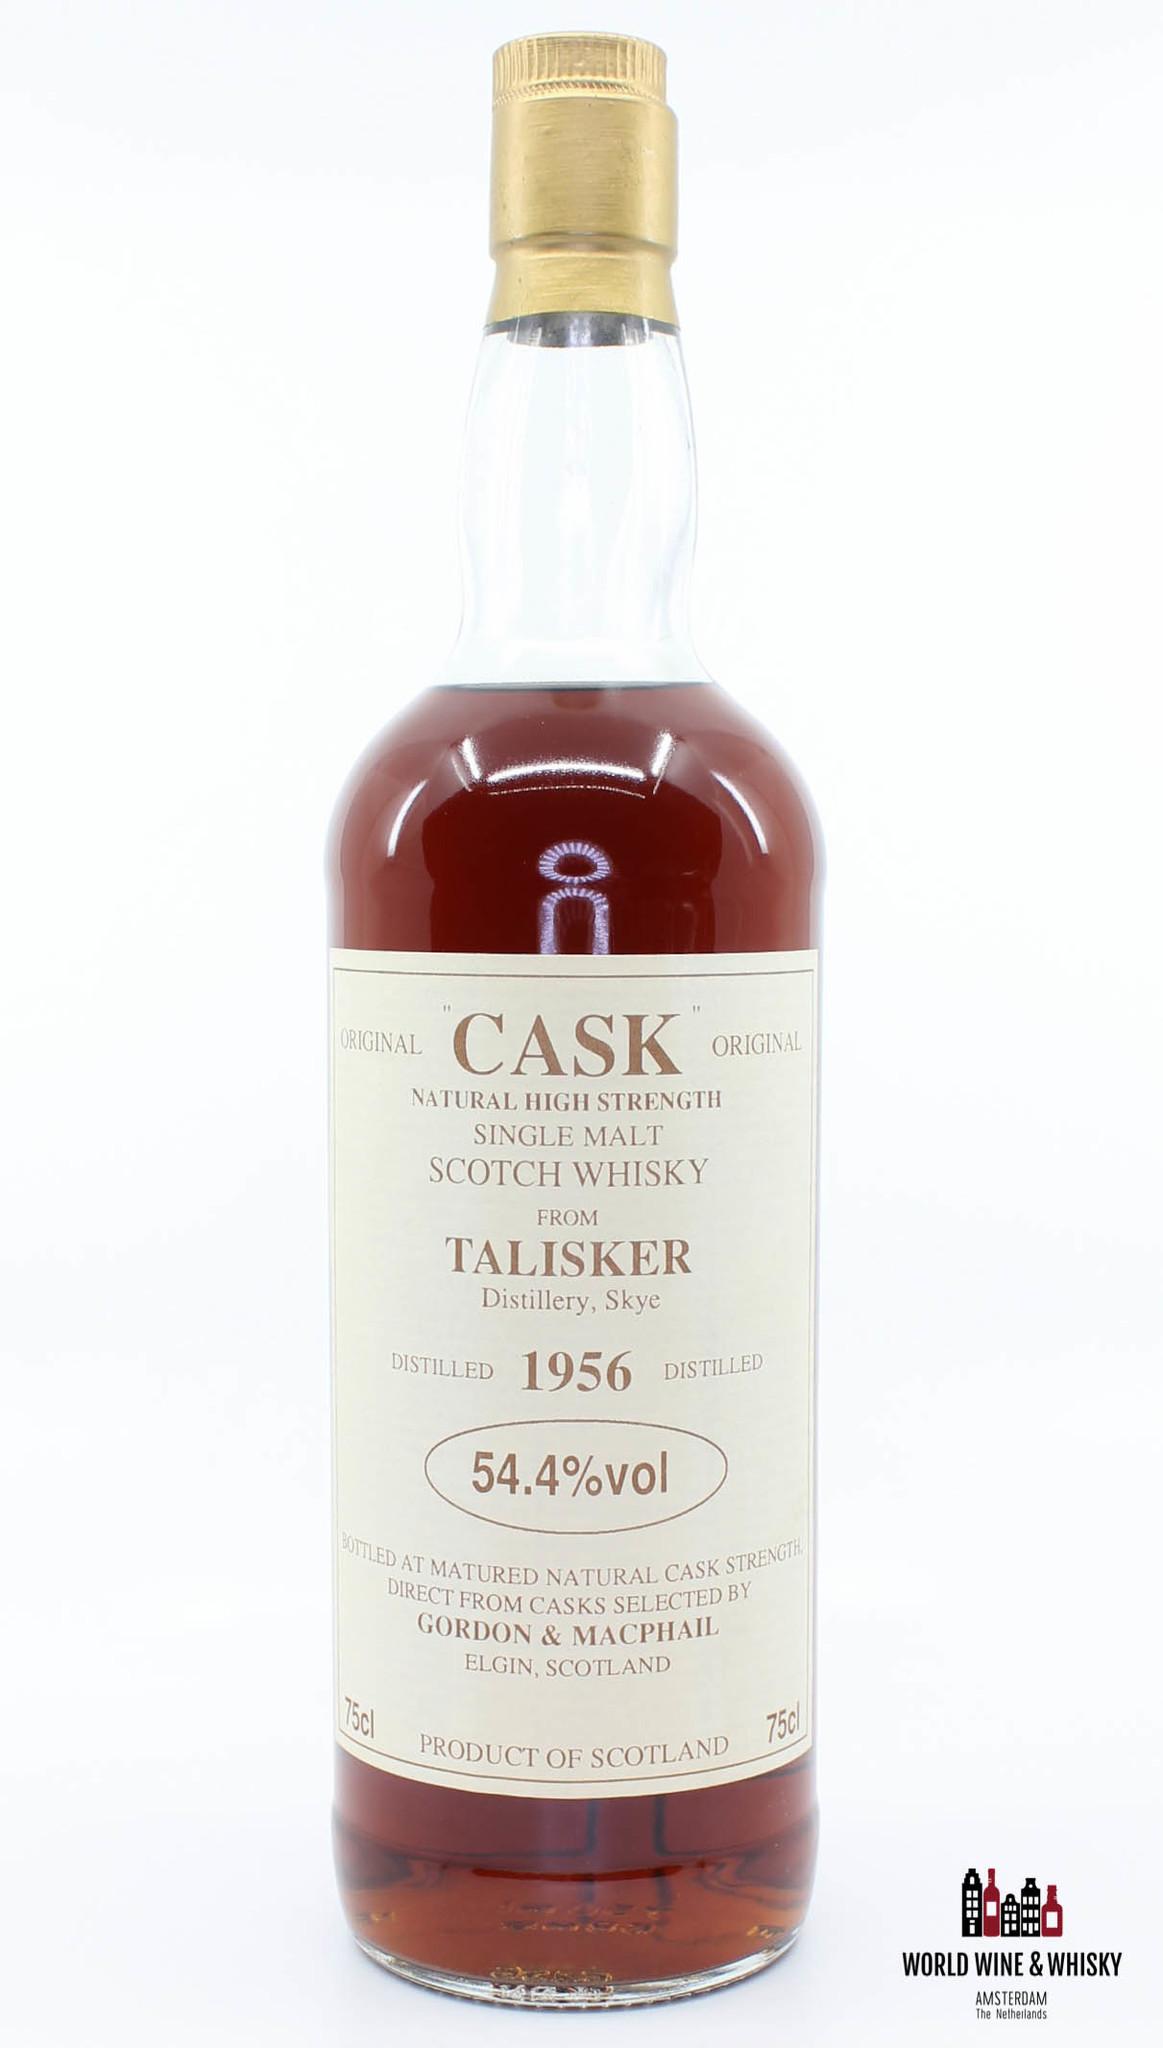 Talisker Talisker 1956 Original Cask - Natural High Strength - Gordon & Macphail 54.4%